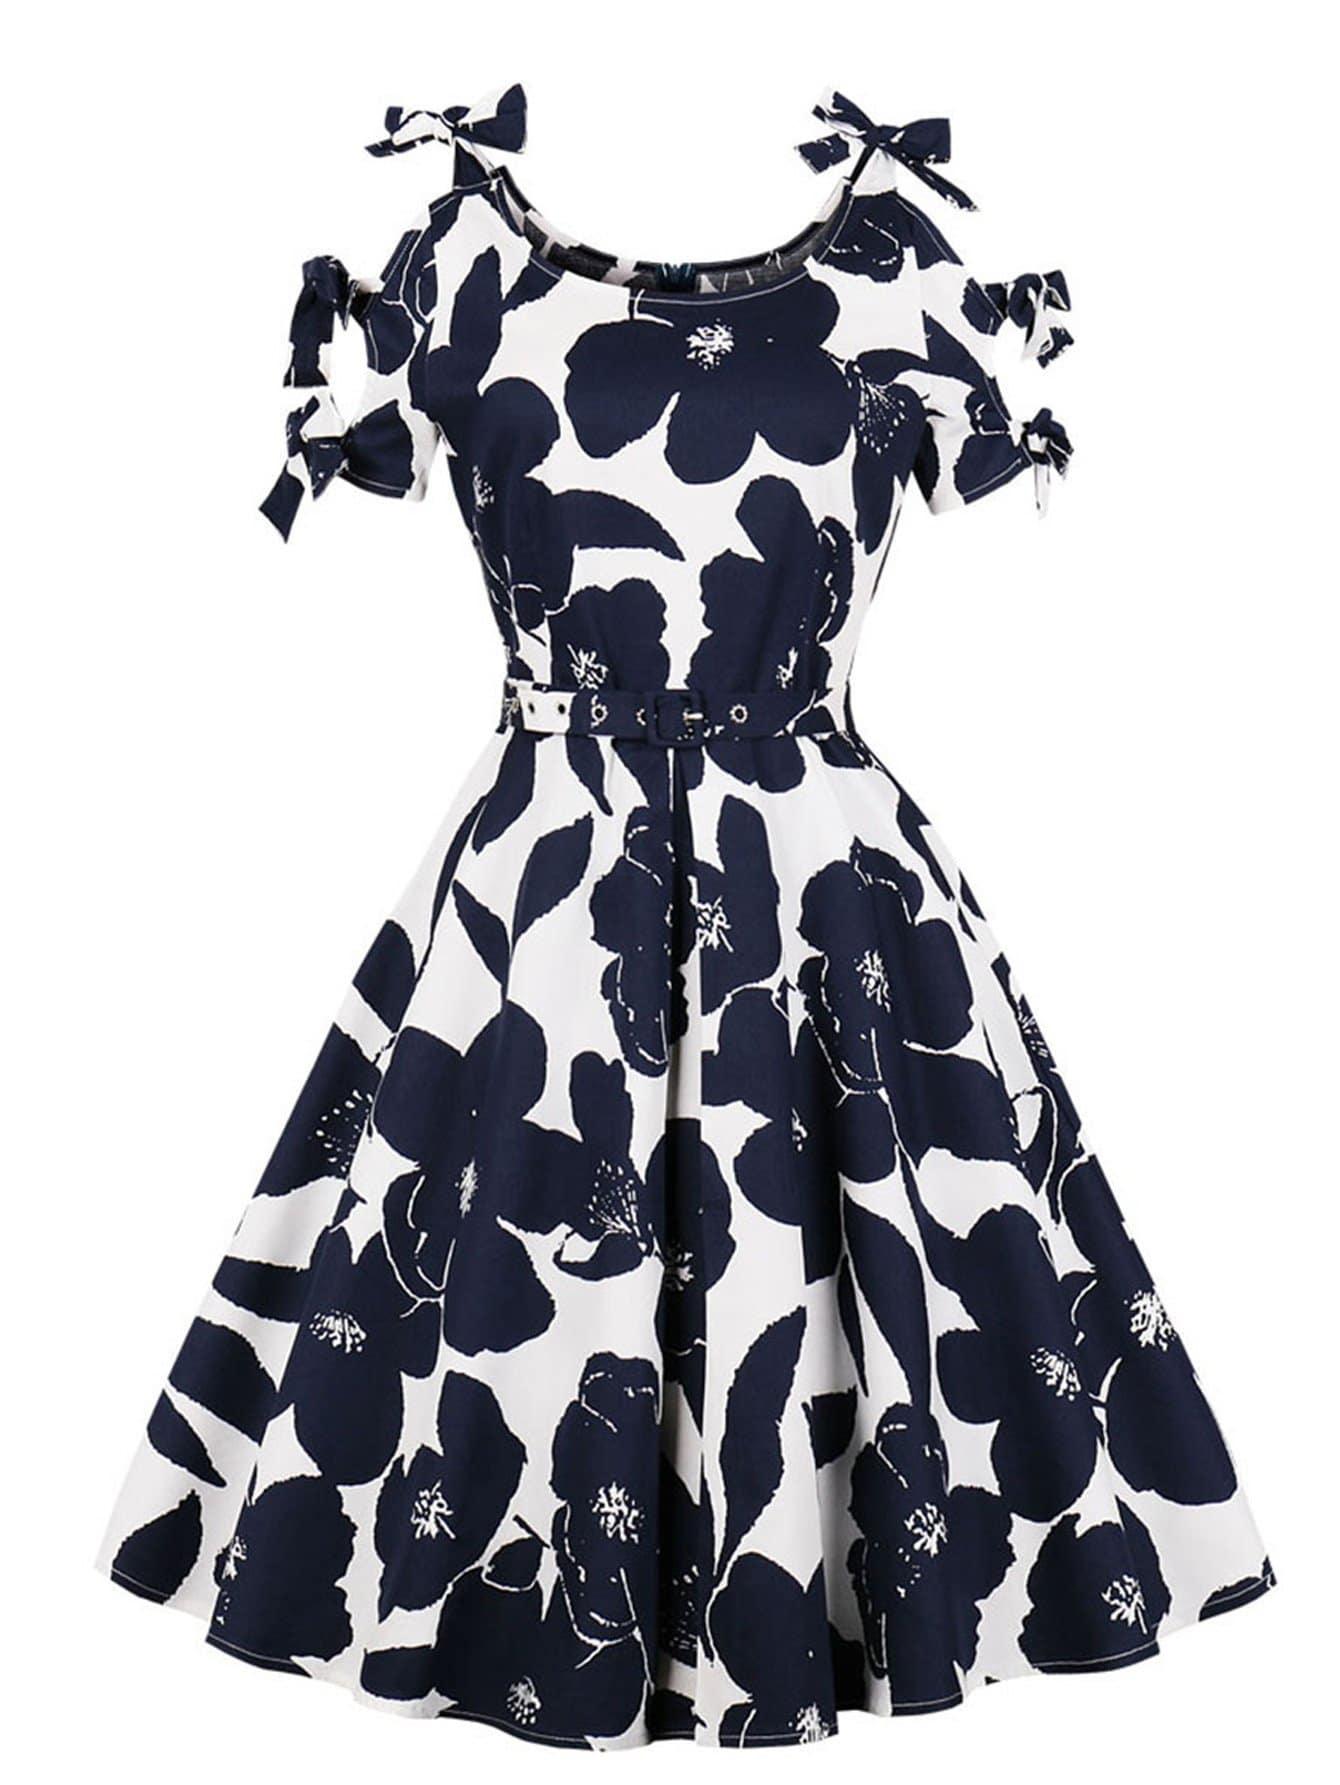 Floral Print Bow Tie Detail Dress